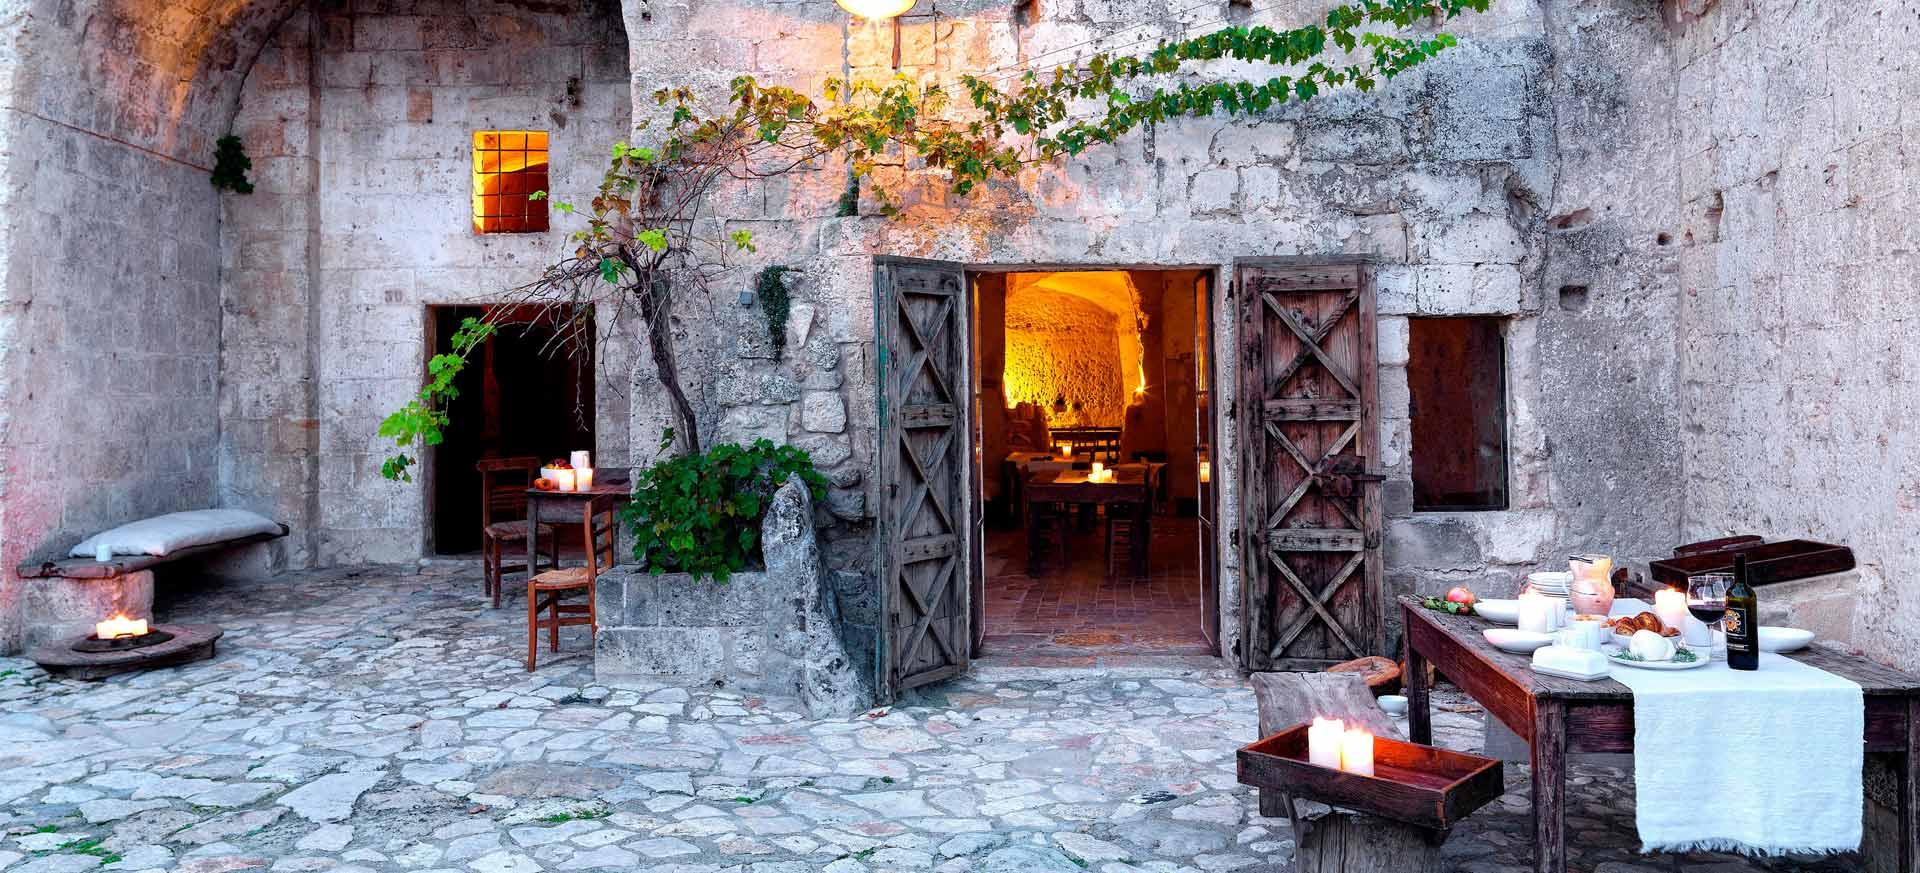 Hotel De Charme Dans Les Sassi De Matera Hote Italia